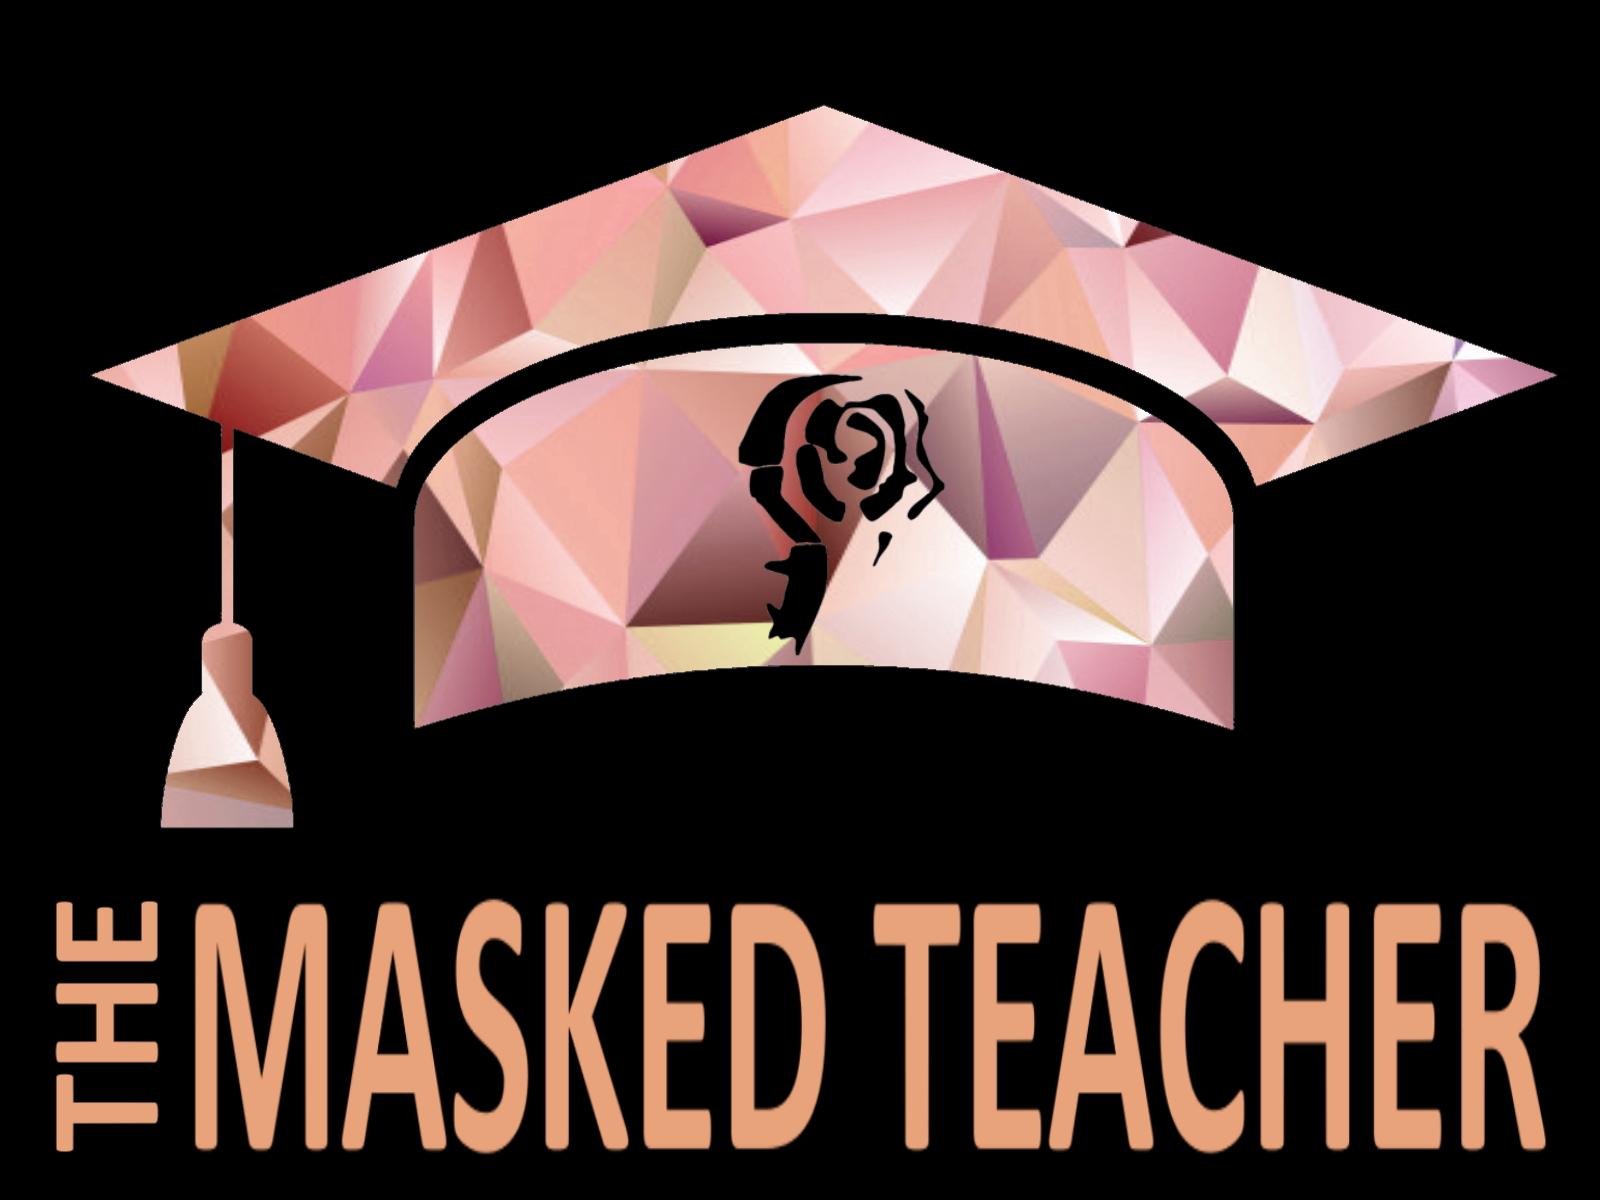 The Masked Teacher